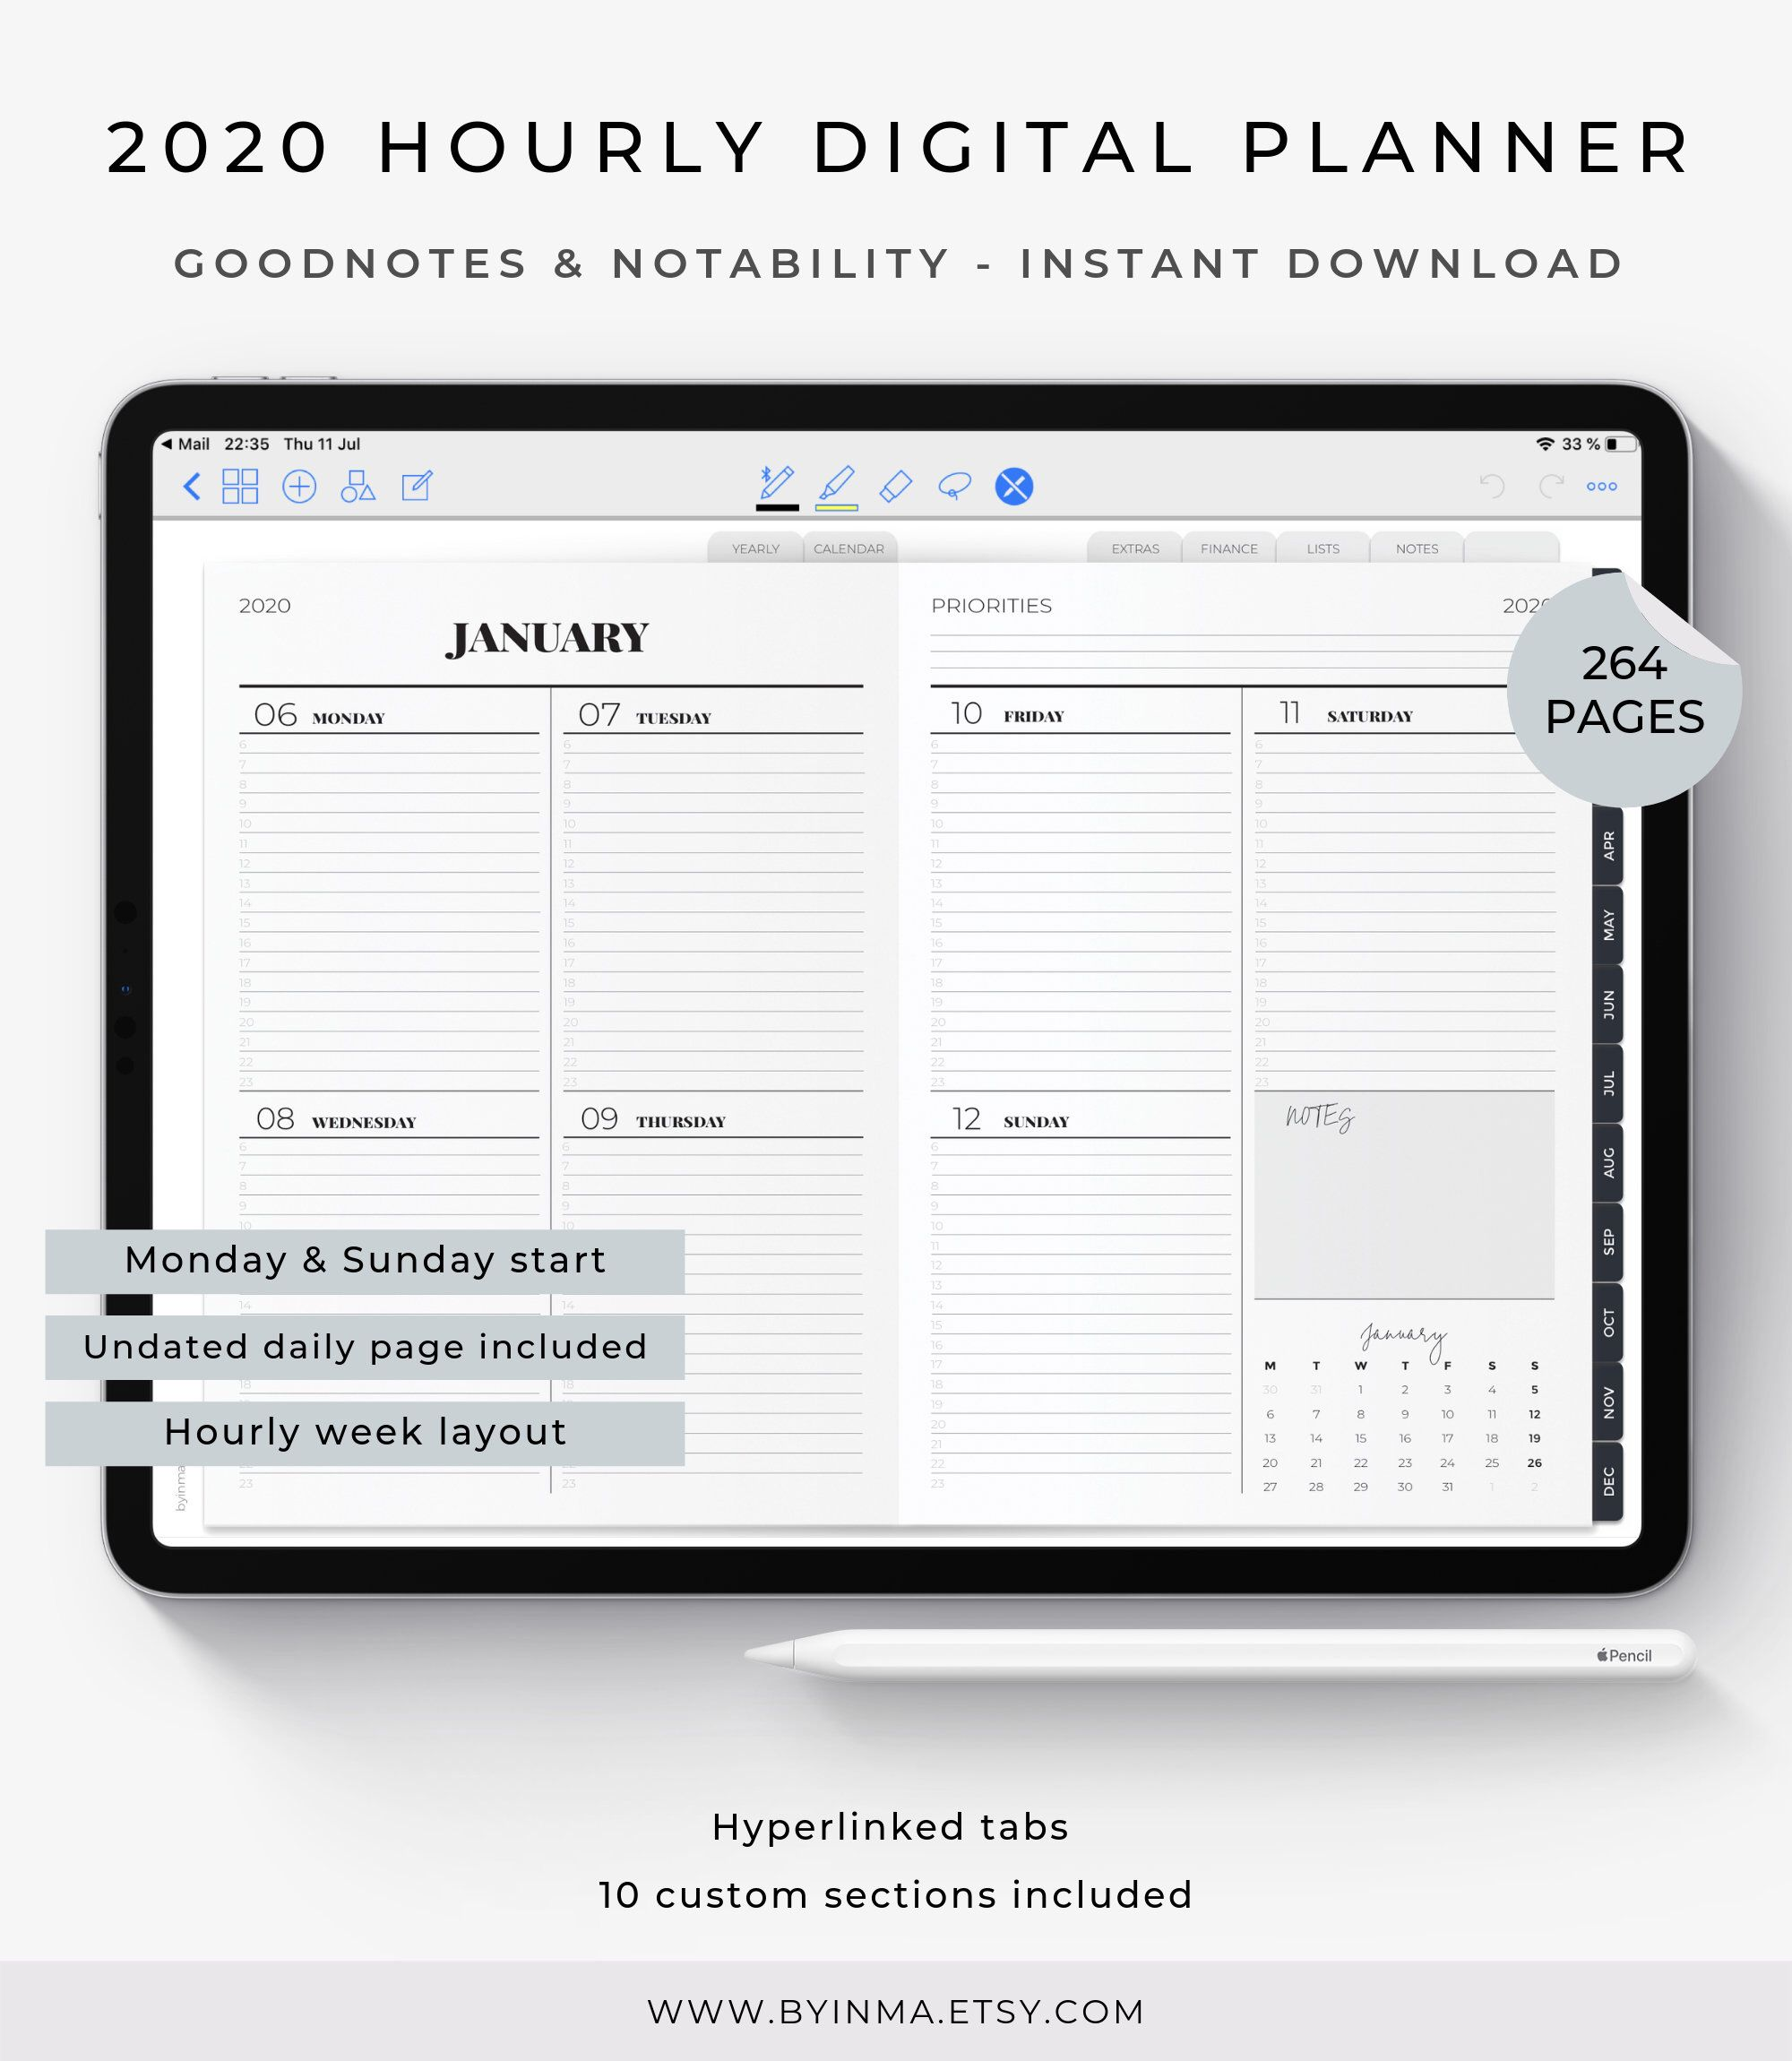 Digital Planner 2020 Goodnotes Planner Digital Planner For Men